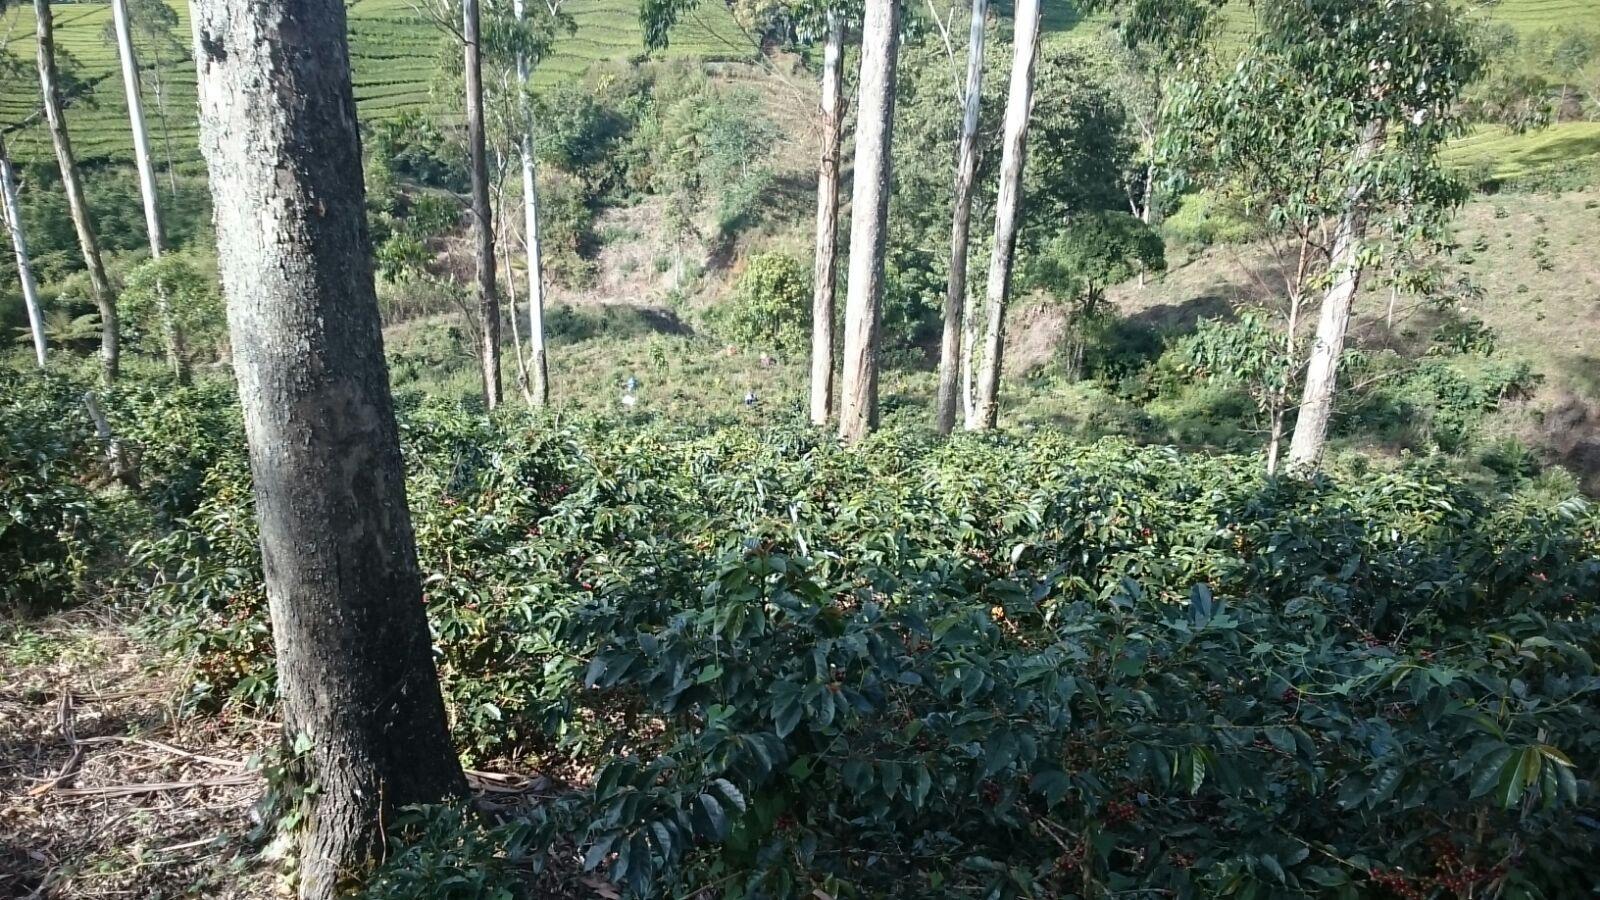 Cultivar S795 (TYPICA)